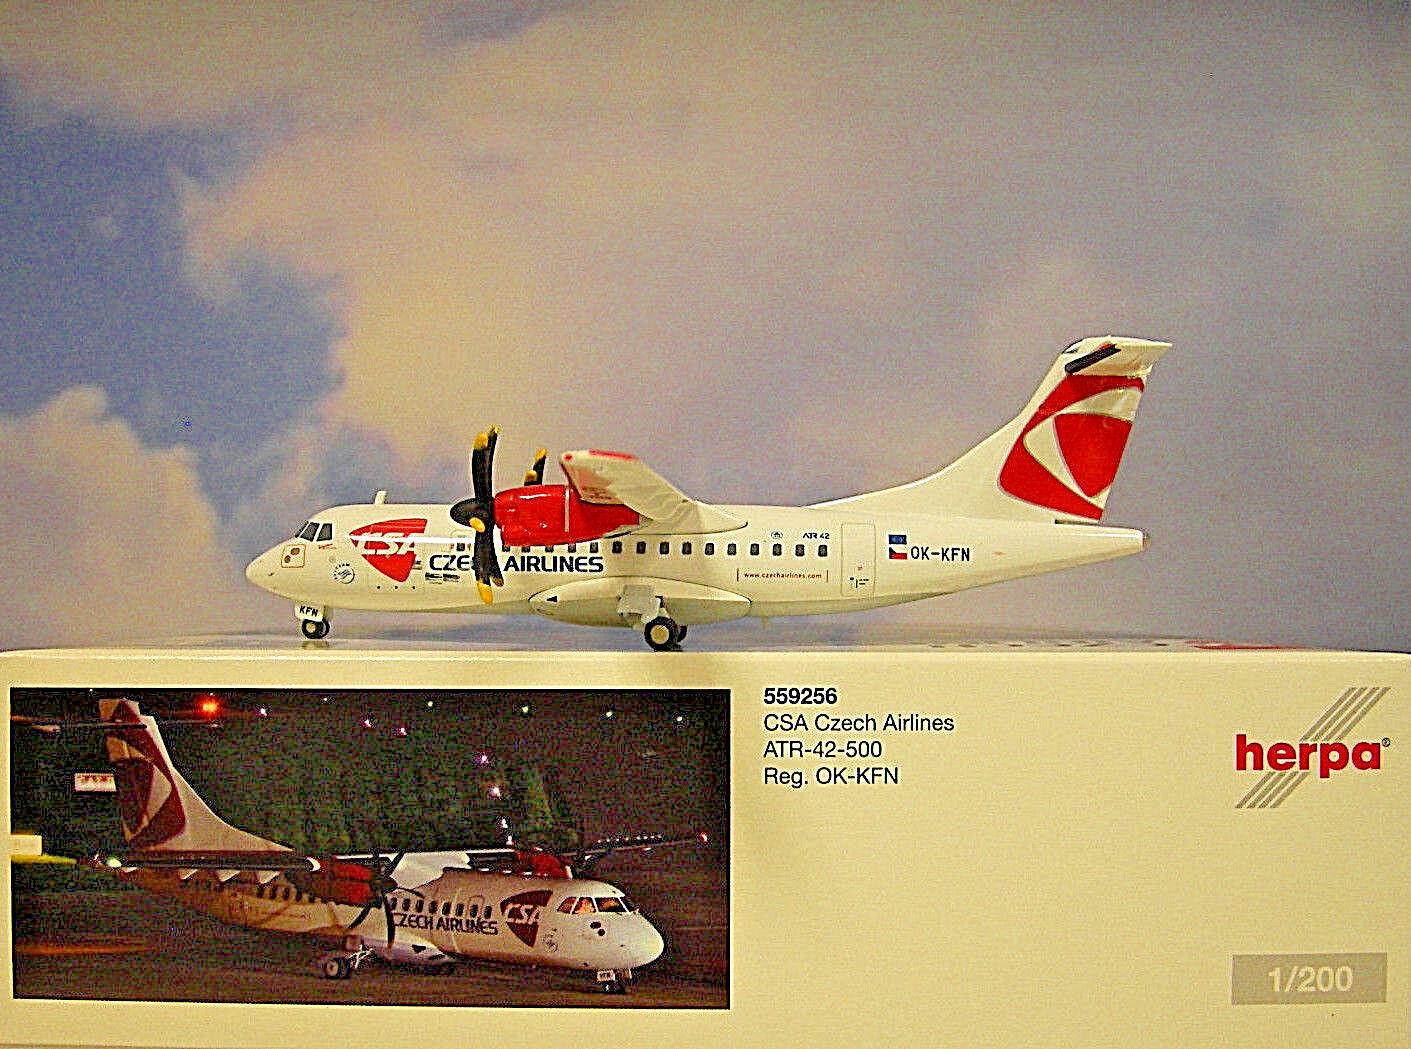 Herpa Wings 1 200 Atr- 42-500 Csa Czech Airline Ok-Kfn 559256